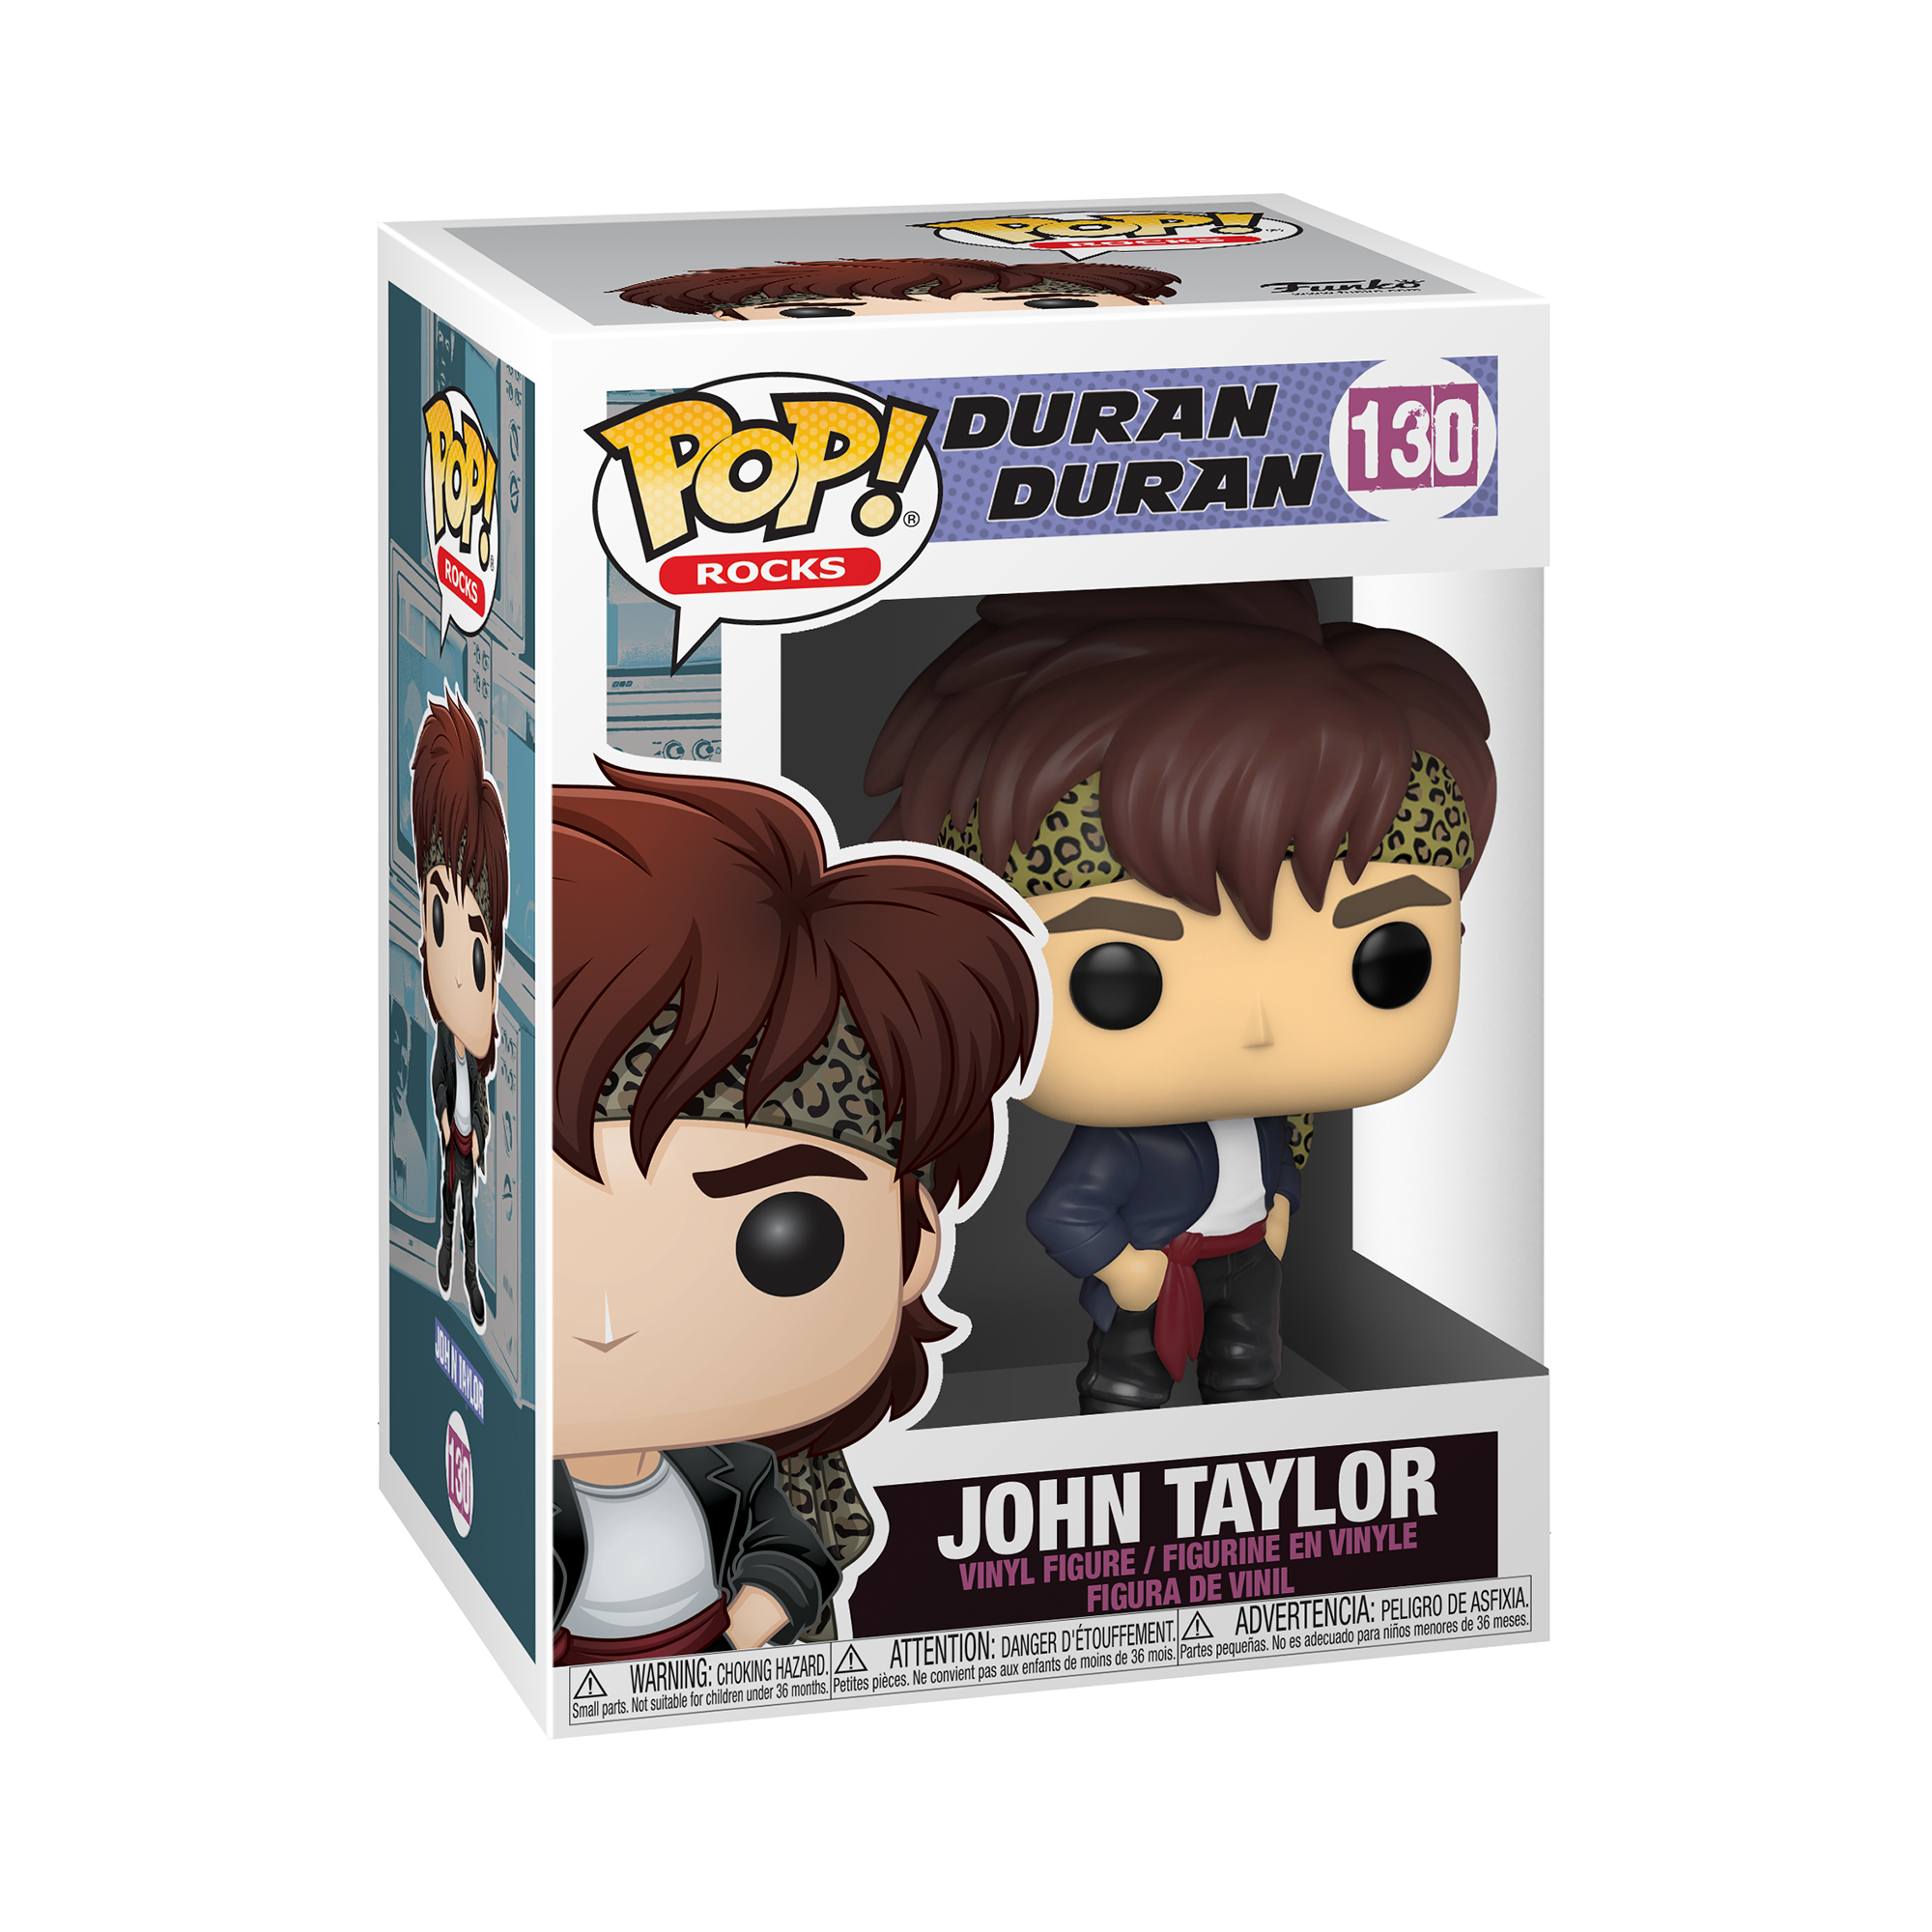 Funko POP Rocks: Duran Duran - John Taylor